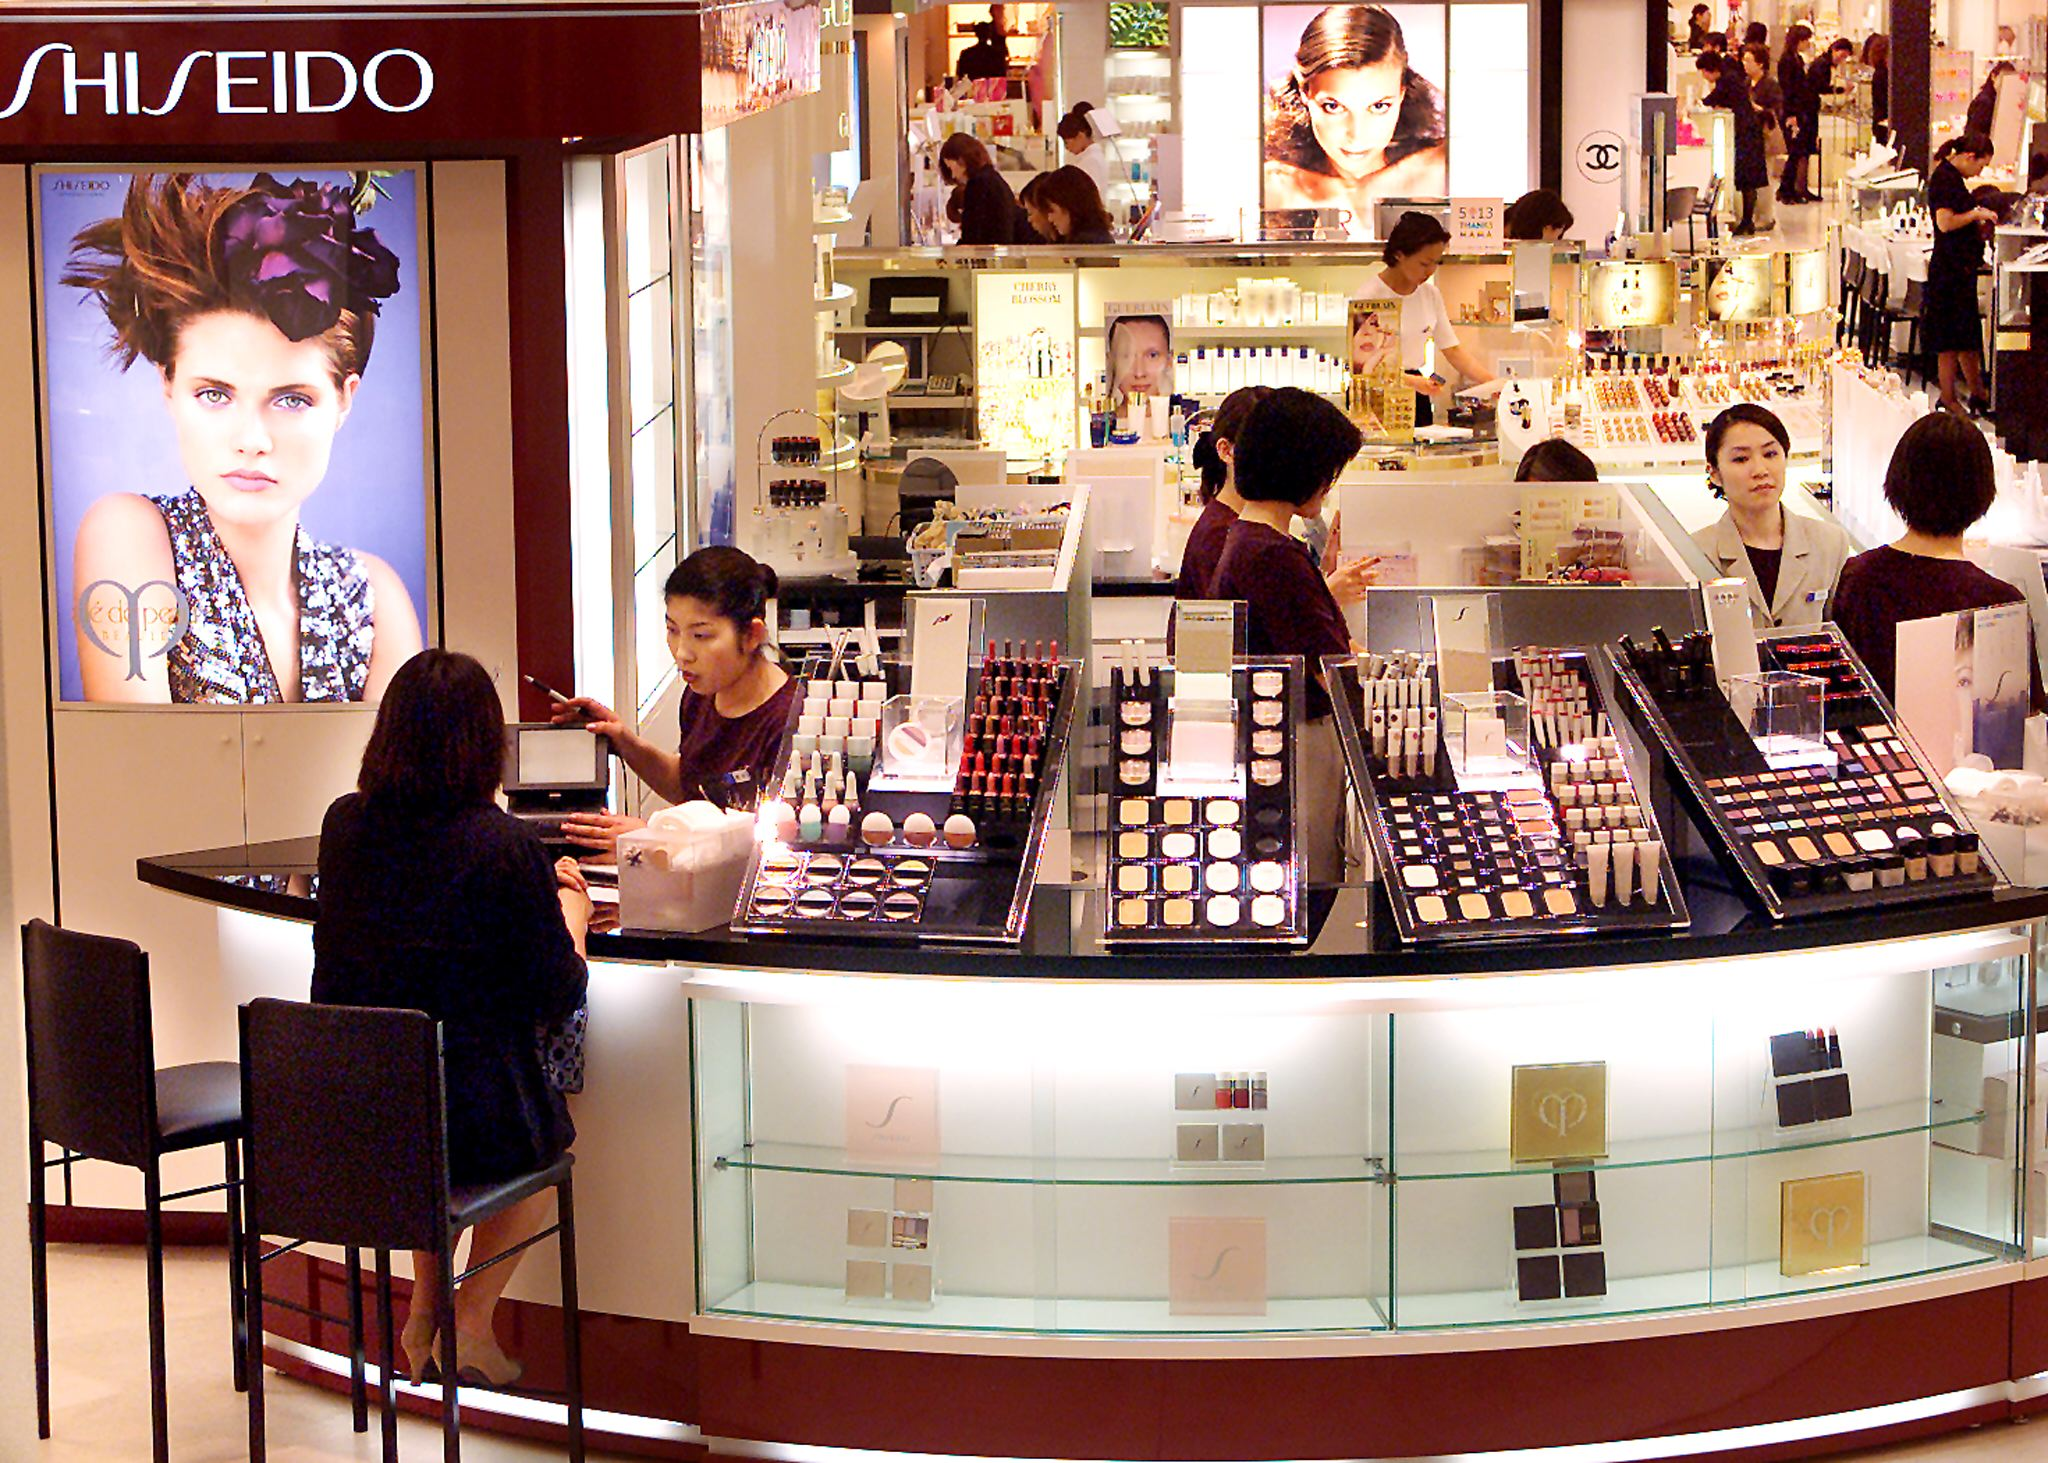 Shiseido Just Bought Customized Makeup